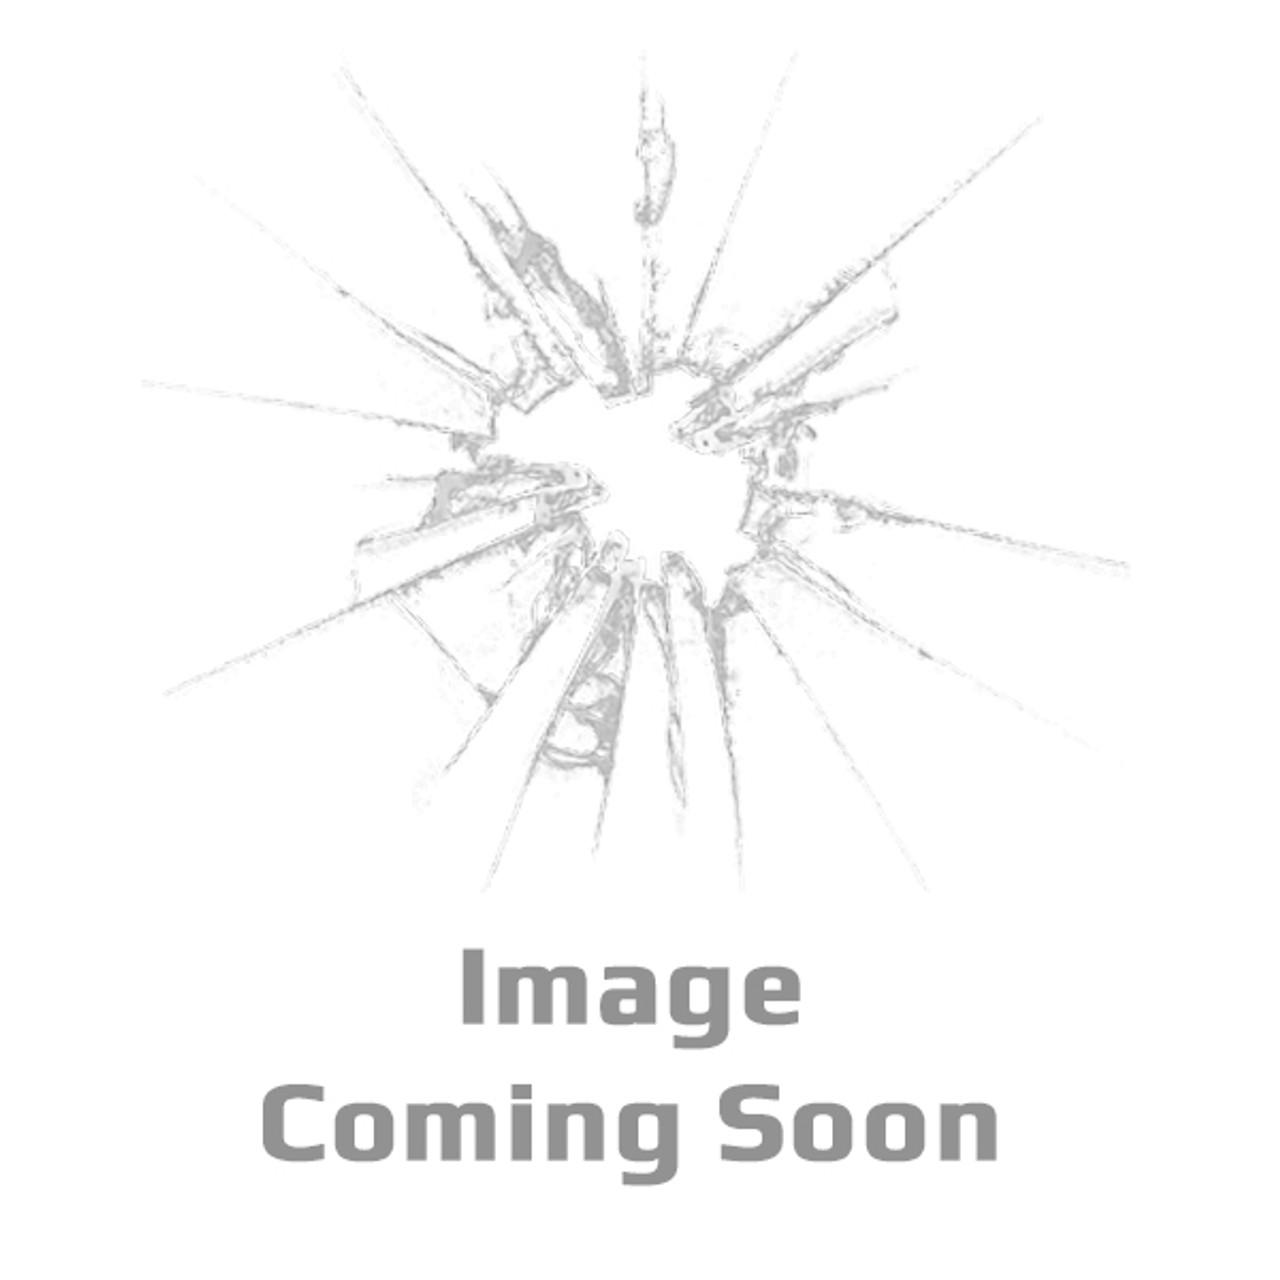 Riton Optics Contessa, Riton Xrc3010t  30mm Tactical Rings